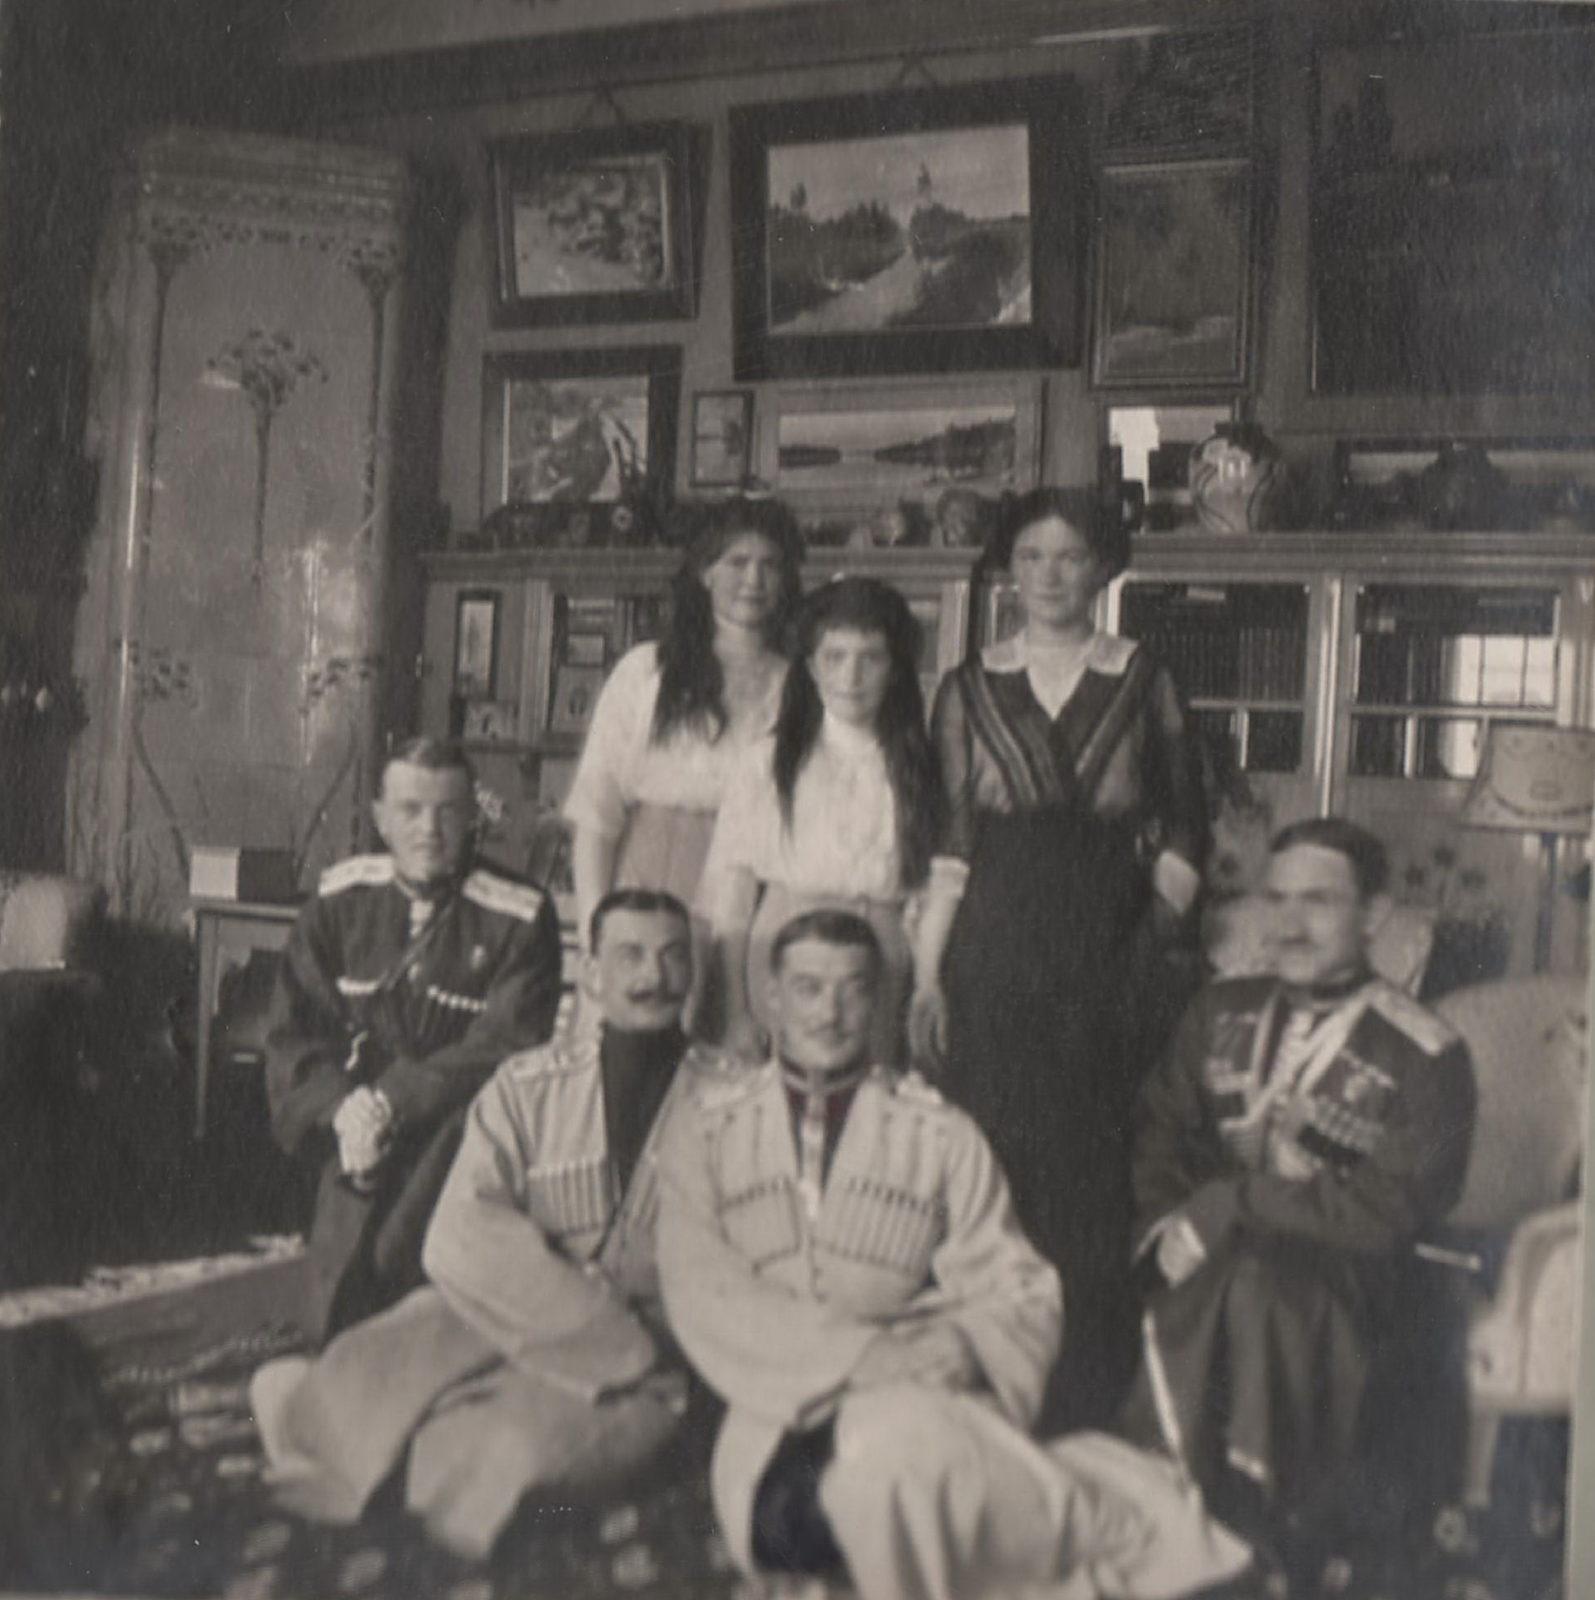 Daughters of Emperor Nicholas II Grand Princess Maria Nikolaevna, Anastasia Nikolaevna and Olga Nikolaevna.